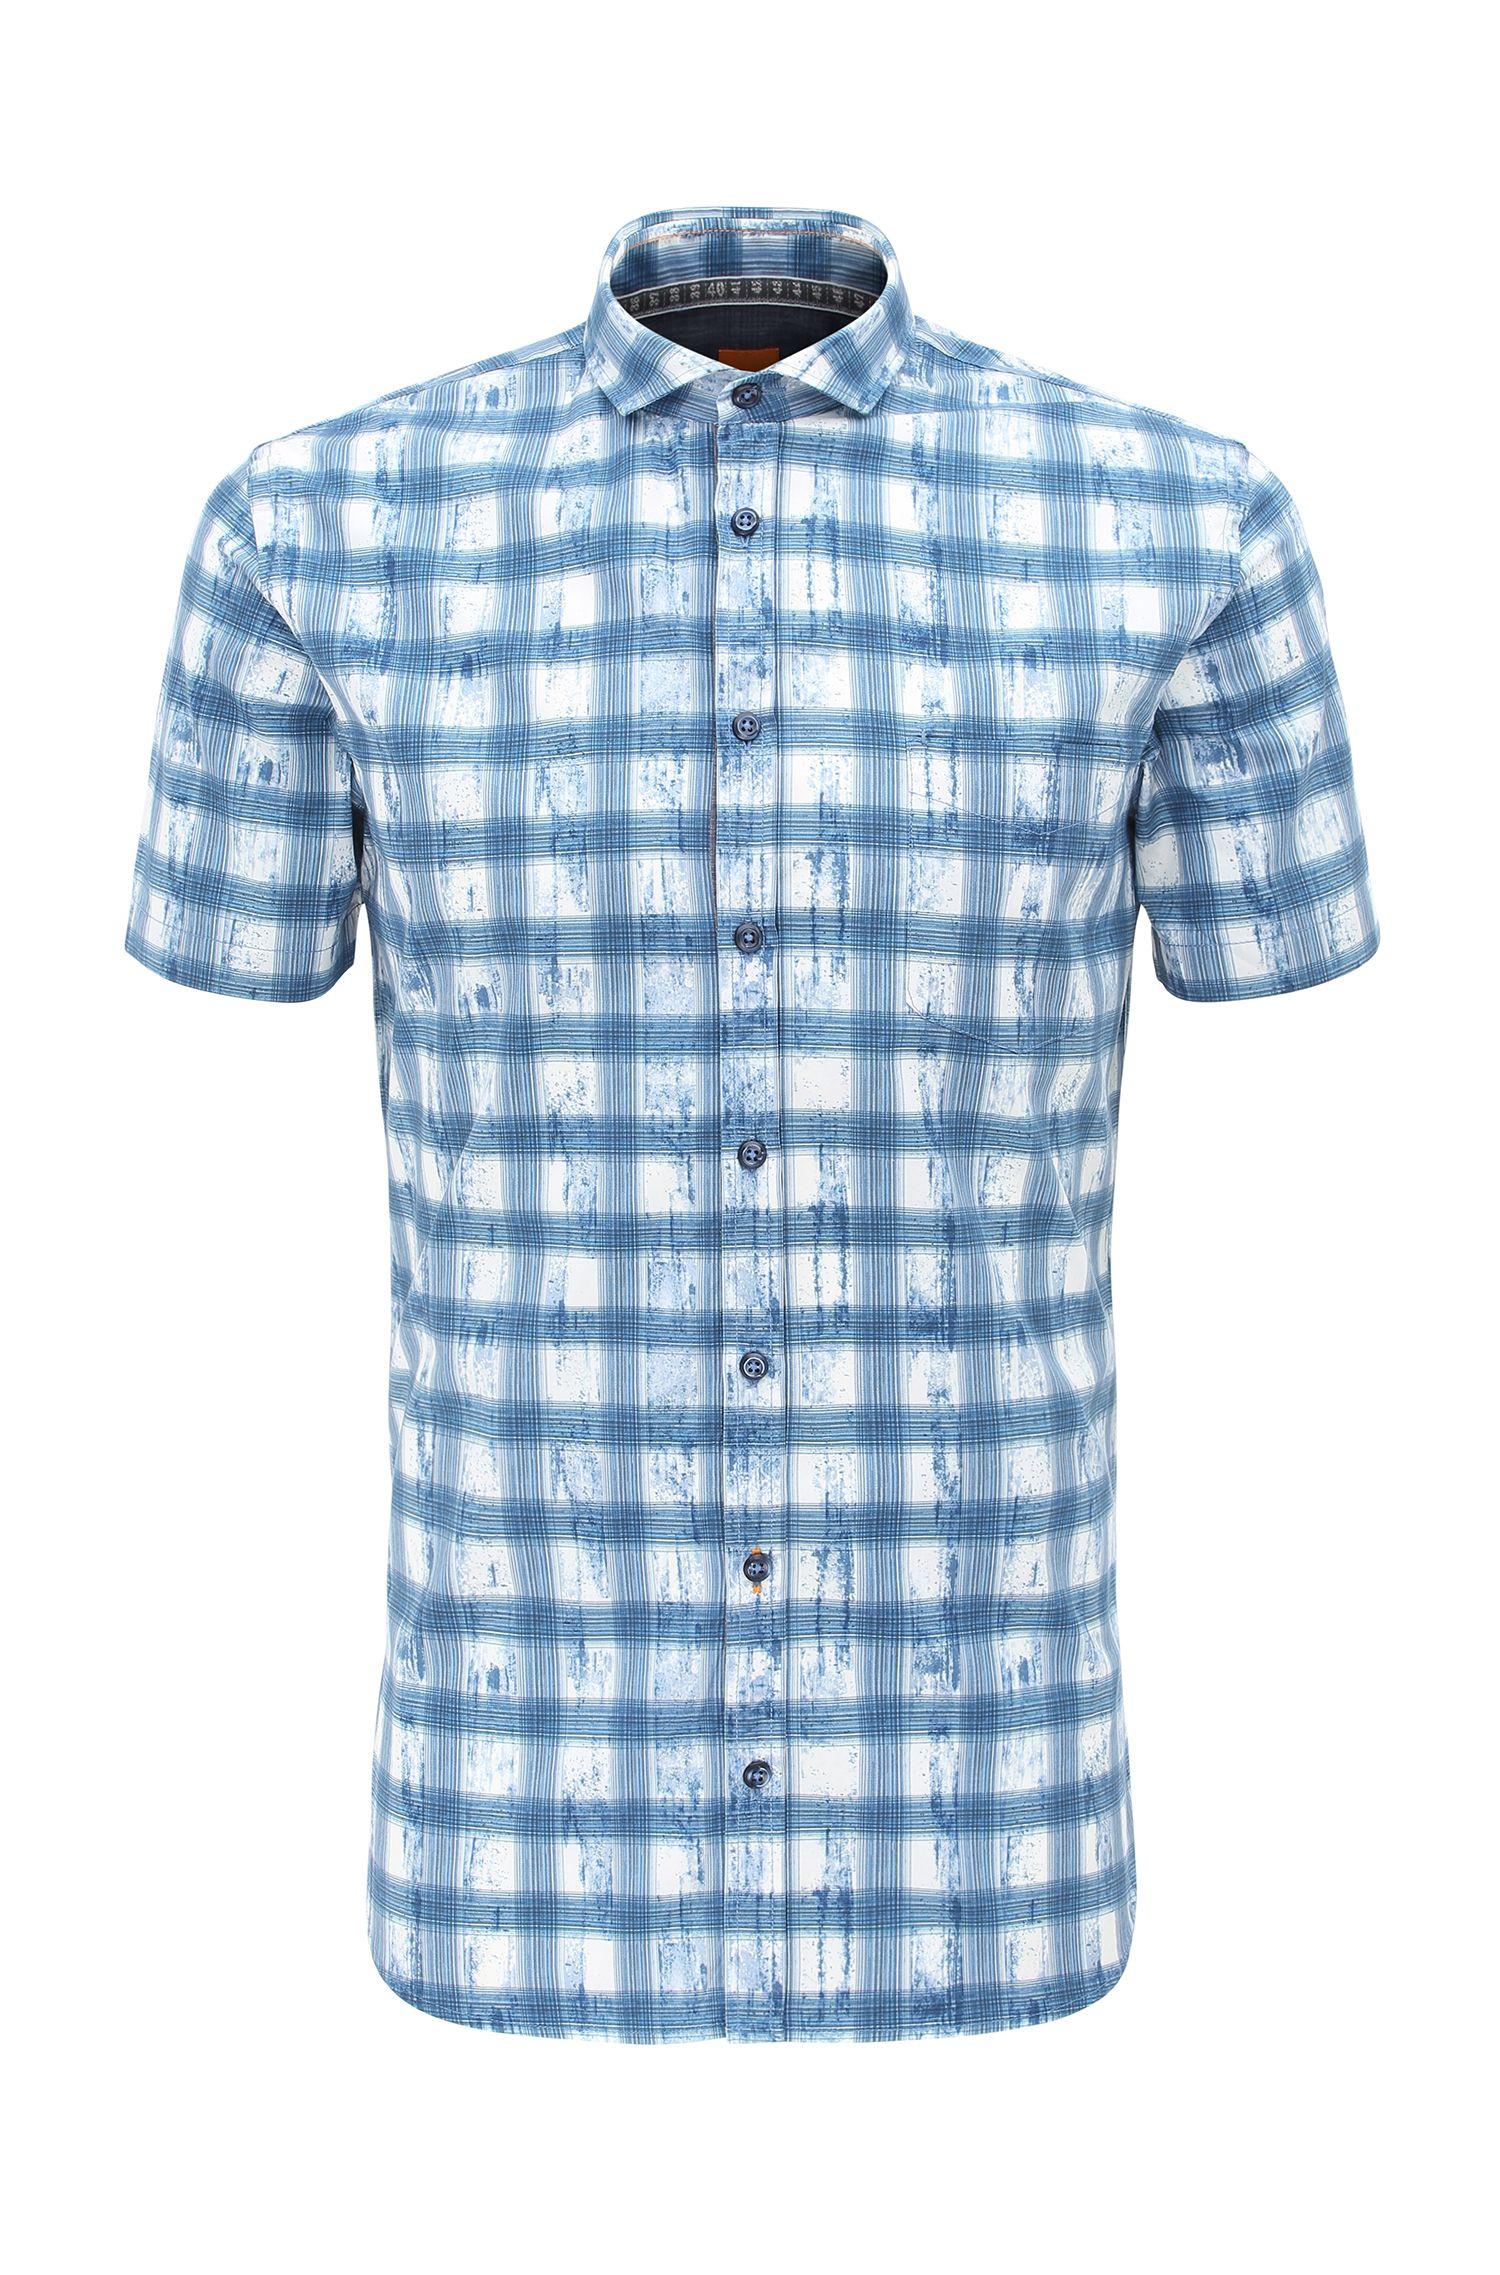 'Catitude Short' | Slim Fit, Cotton Short Sleeve Sport Shirt